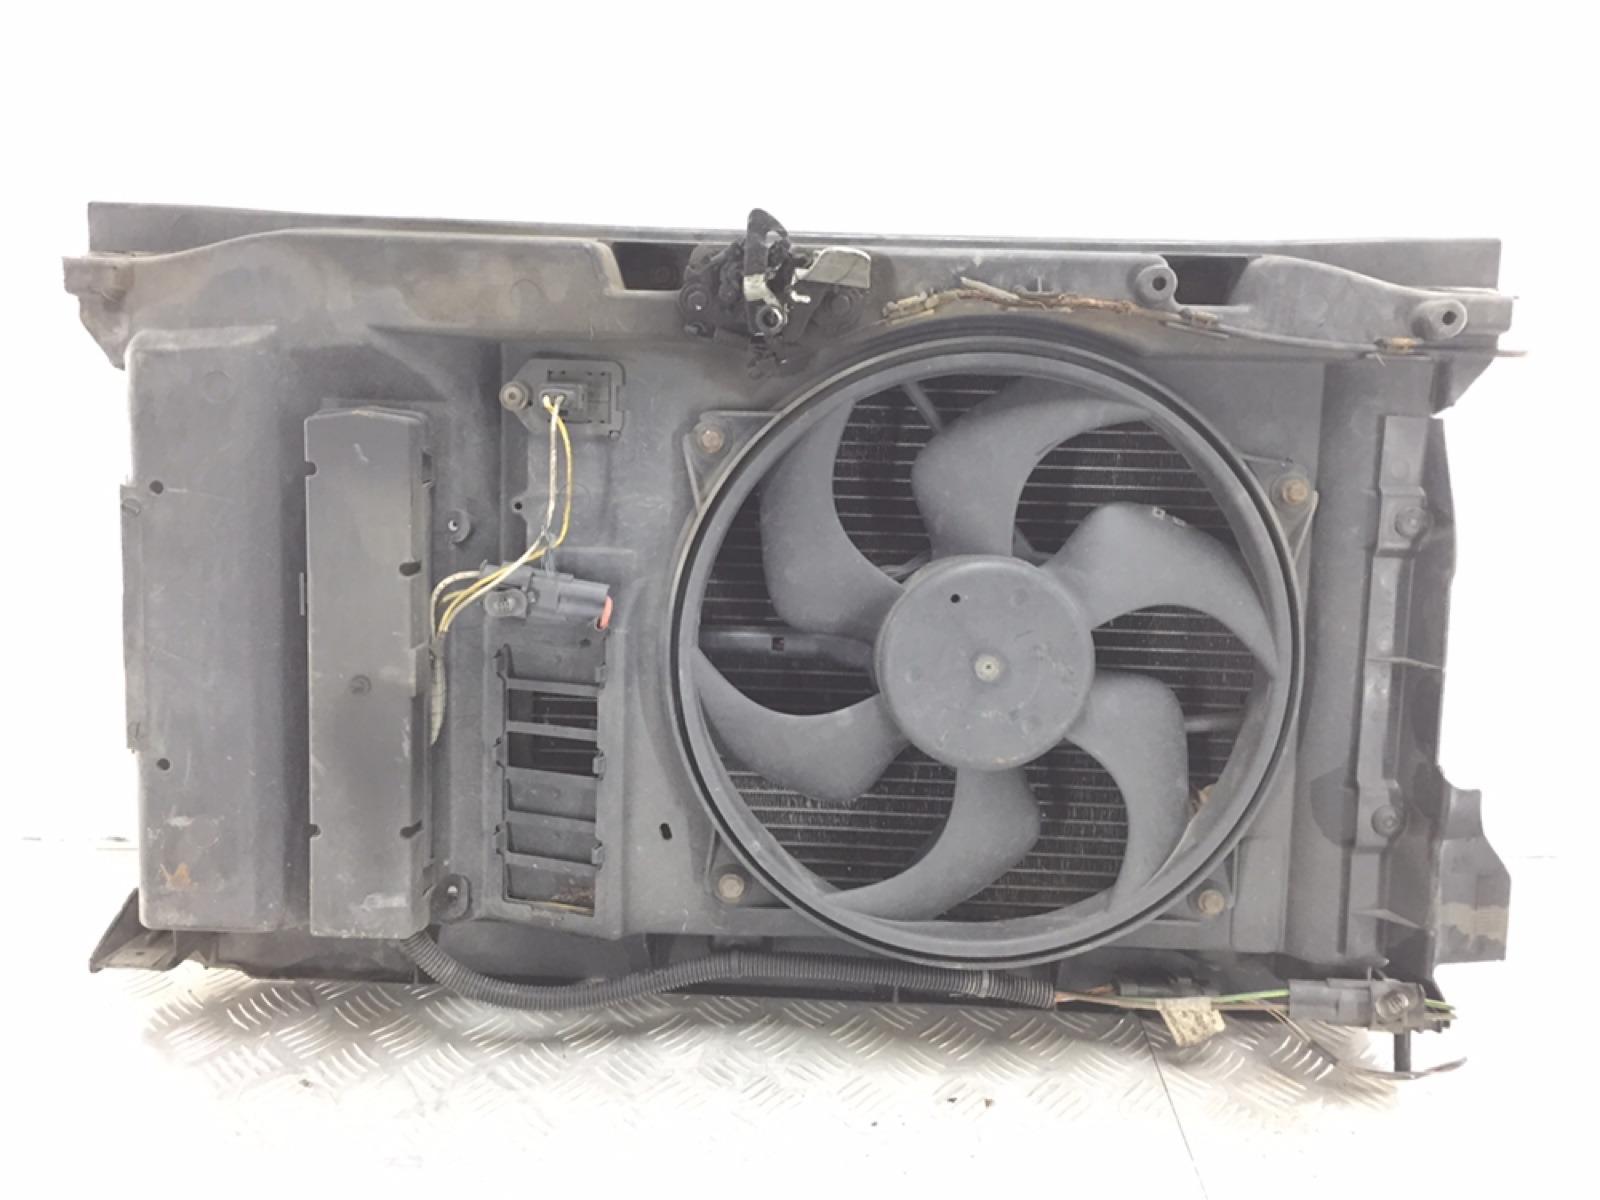 Кассета радиаторов Peugeot 307 2.0 HDI 2003 (б/у)